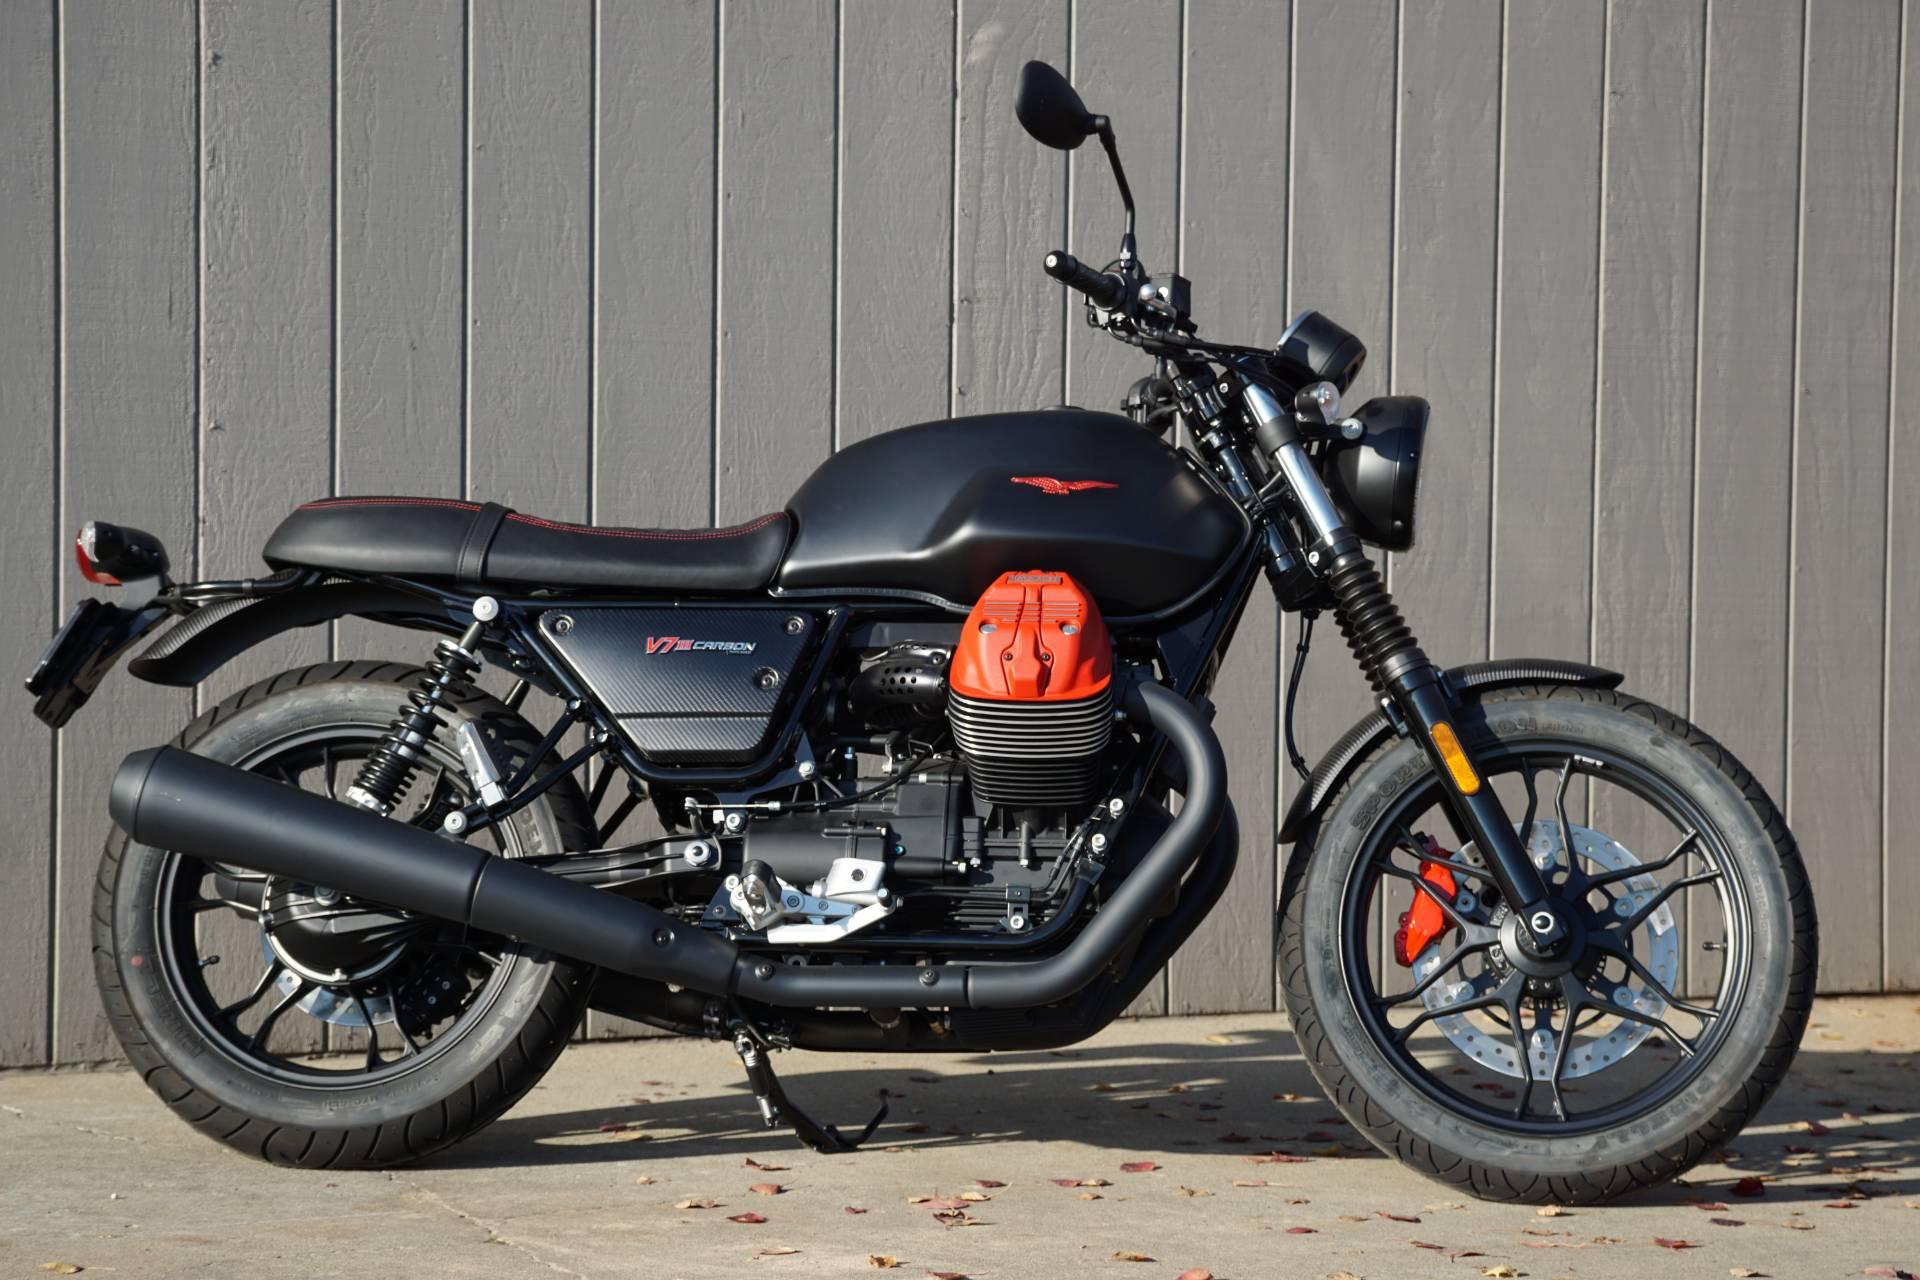 New 2018 Moto Guzzi V7 Iii Carbon Dark Motorcycles In Elk Grove Ca